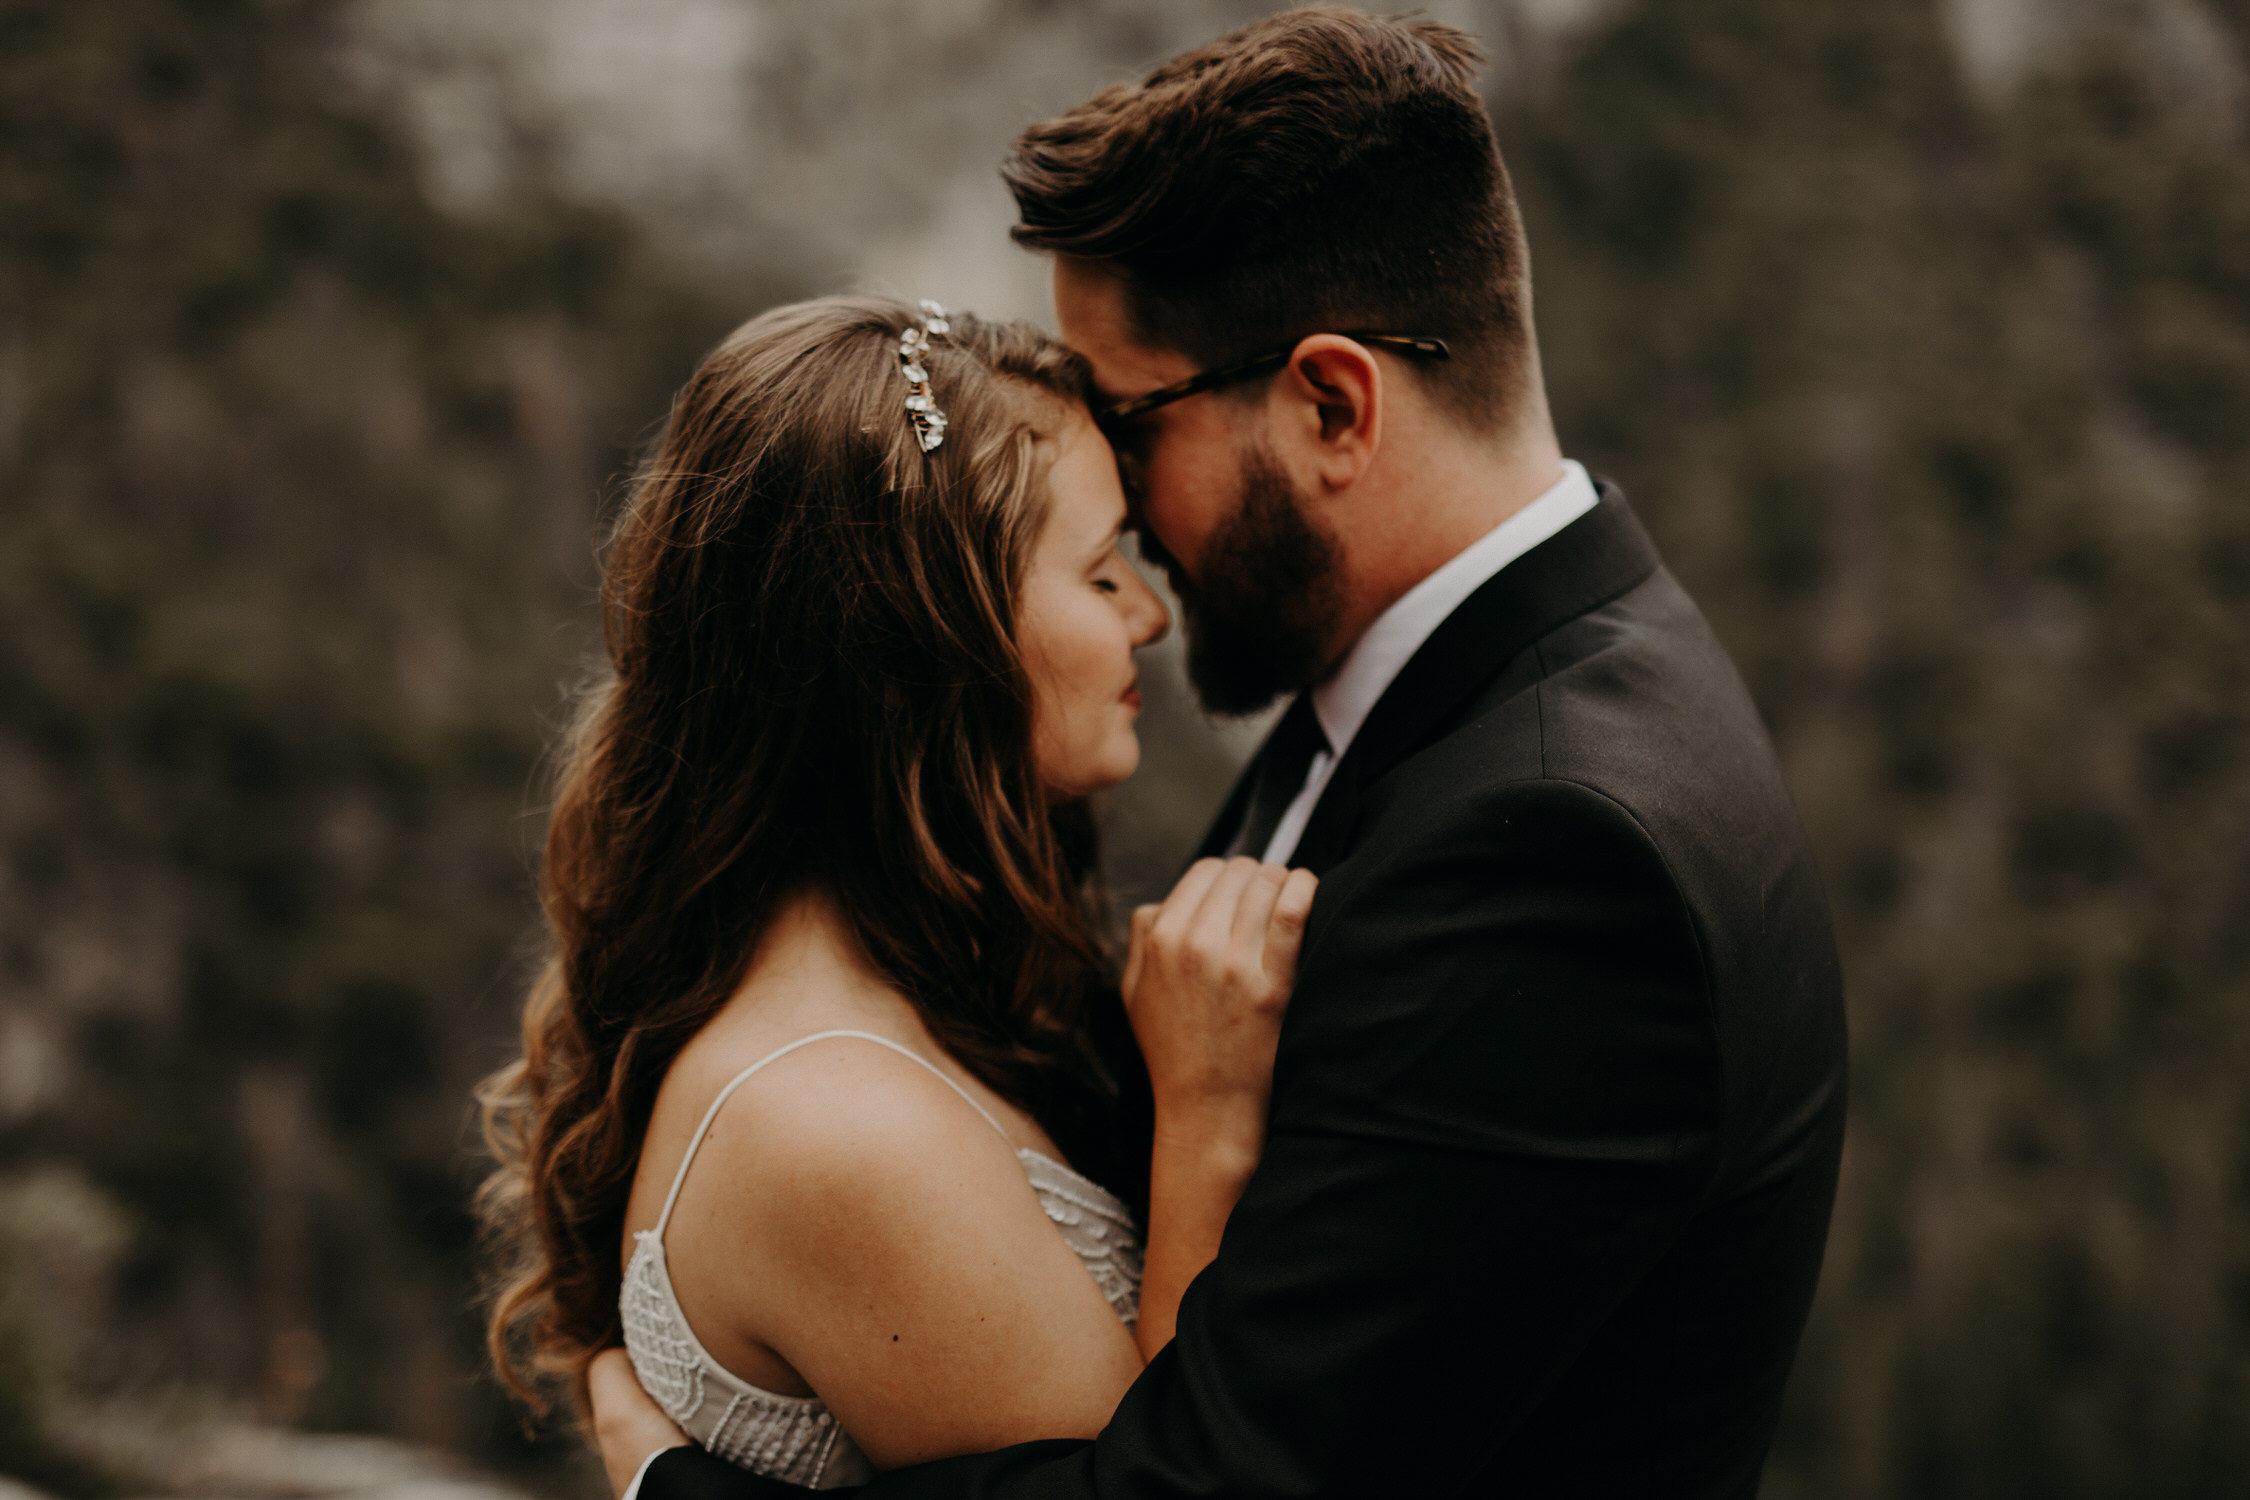 intimate-couple-elopement-yosemite-31.jpg